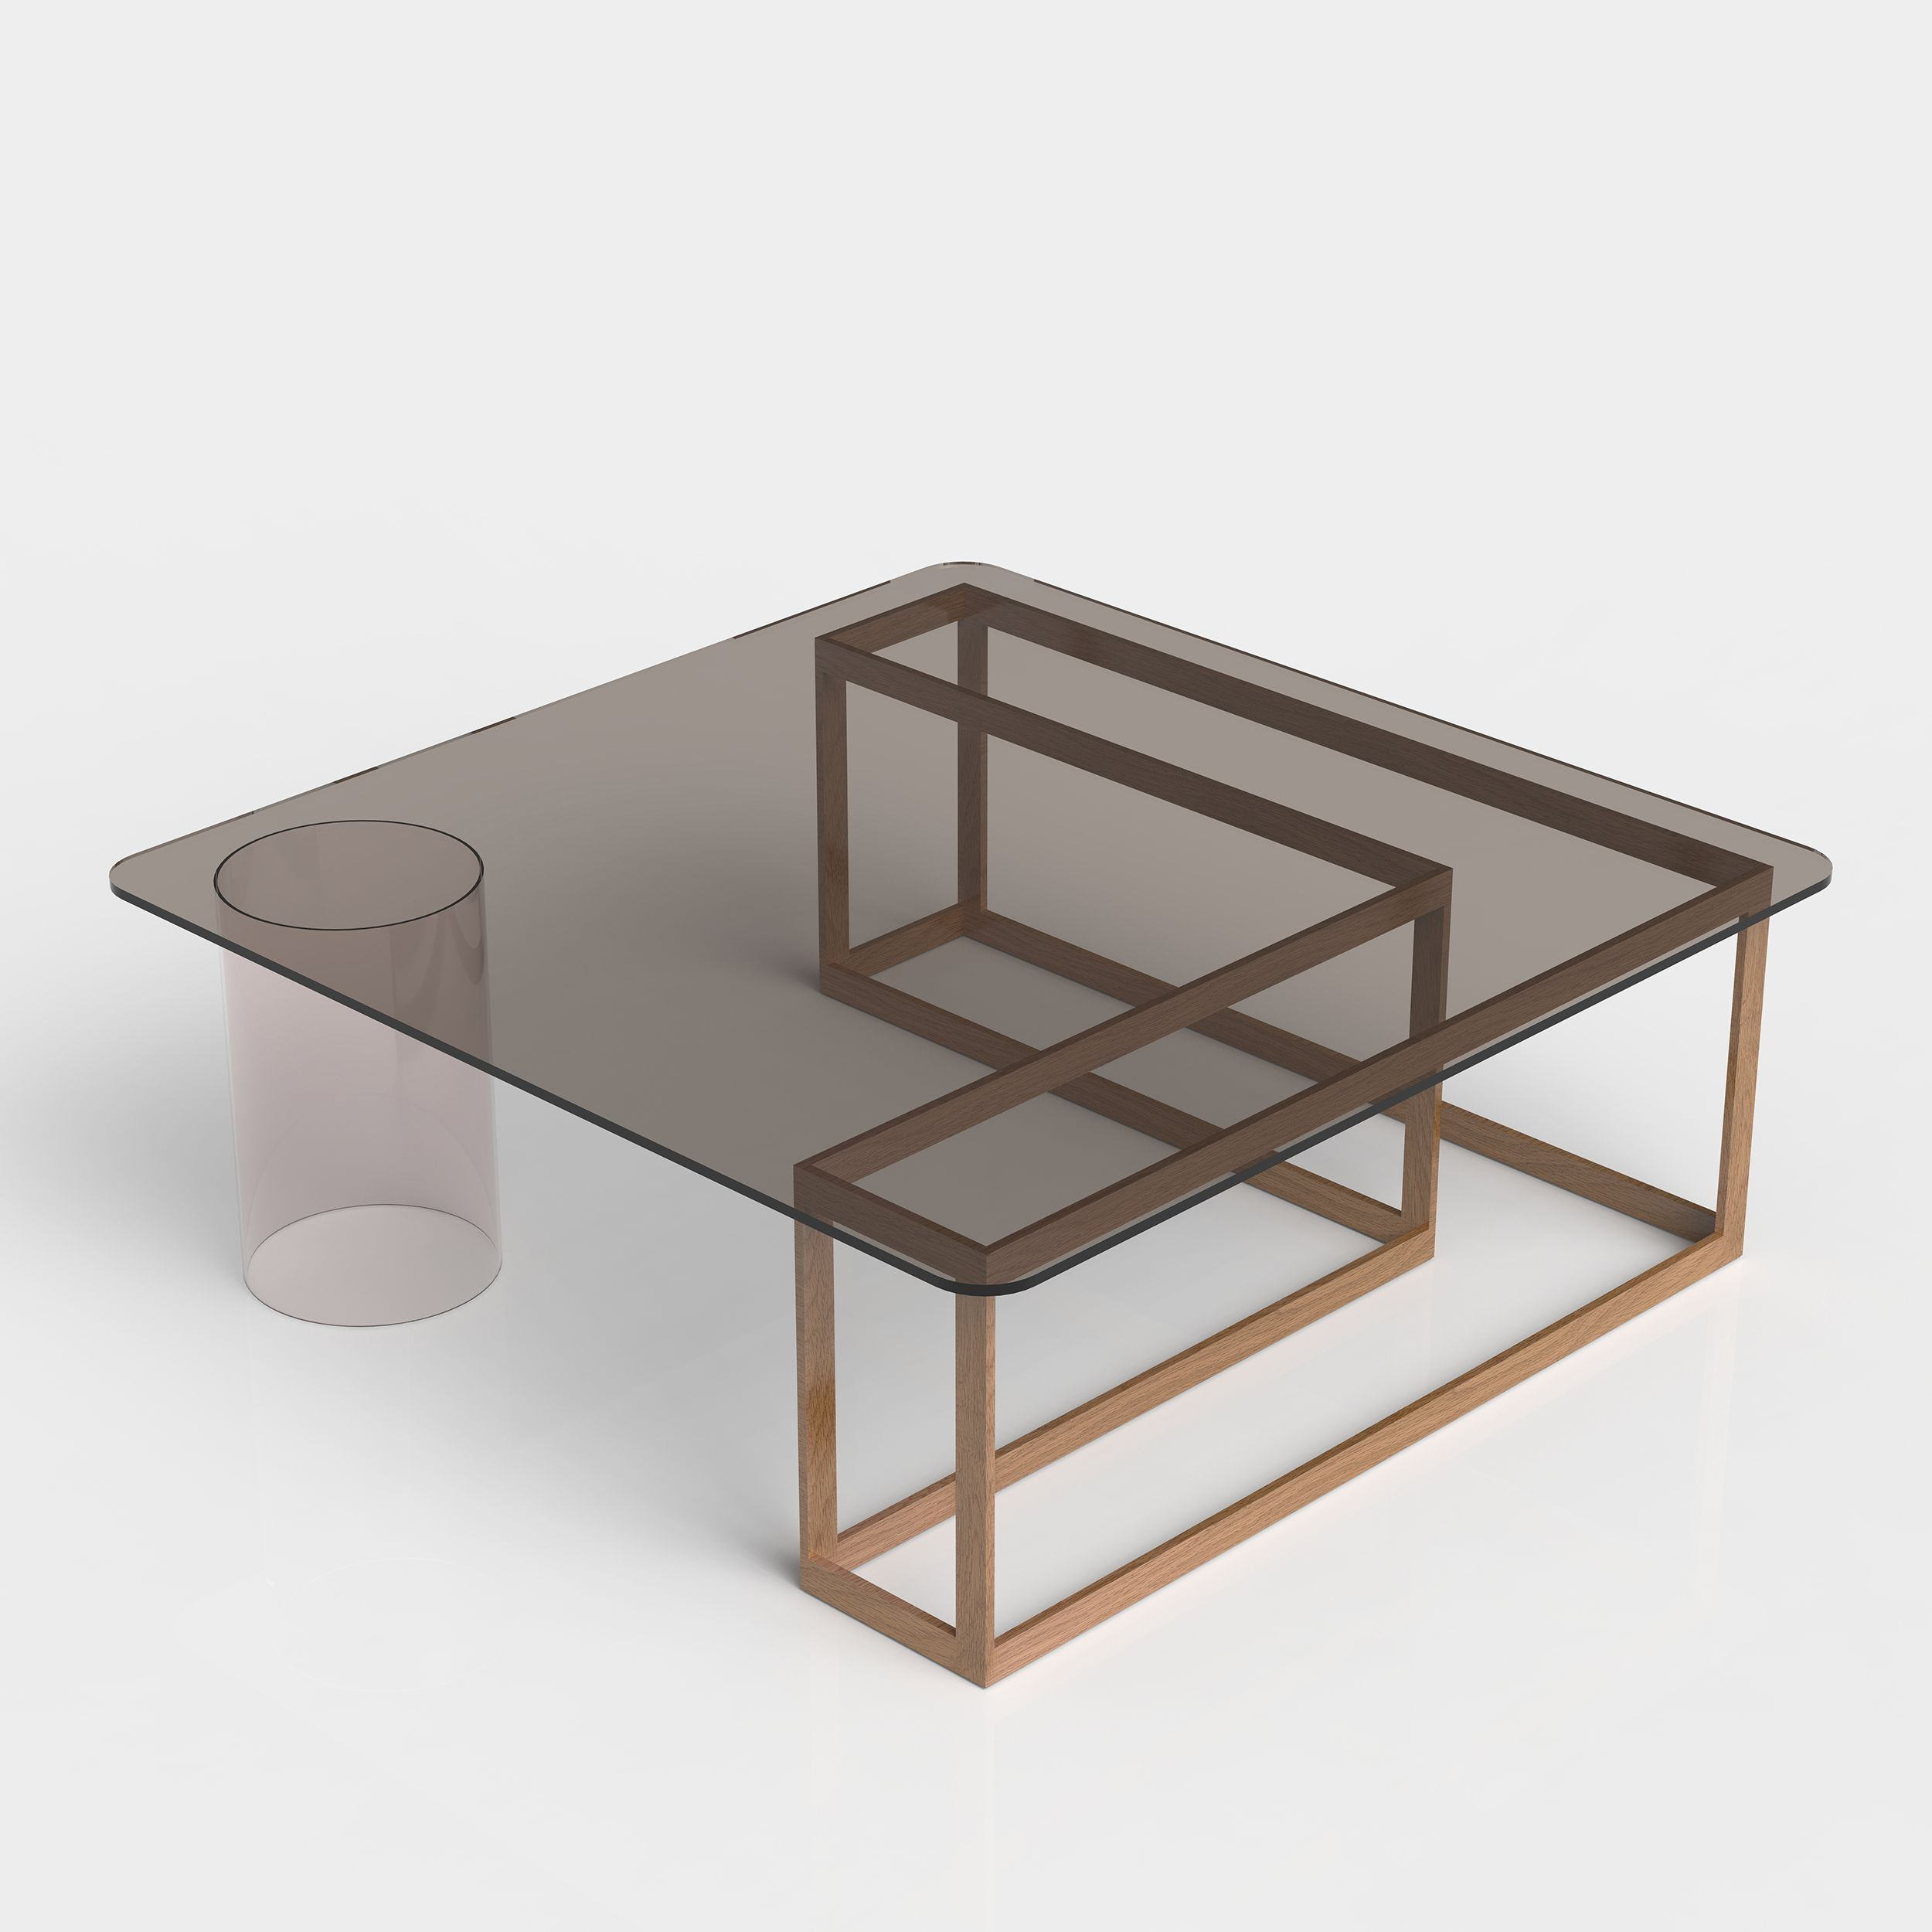 Nunki Coffee Table Square Iacoli Mcallister Coffee Table Square Coffee Table Livingroom Layout [ 2500 x 2500 Pixel ]